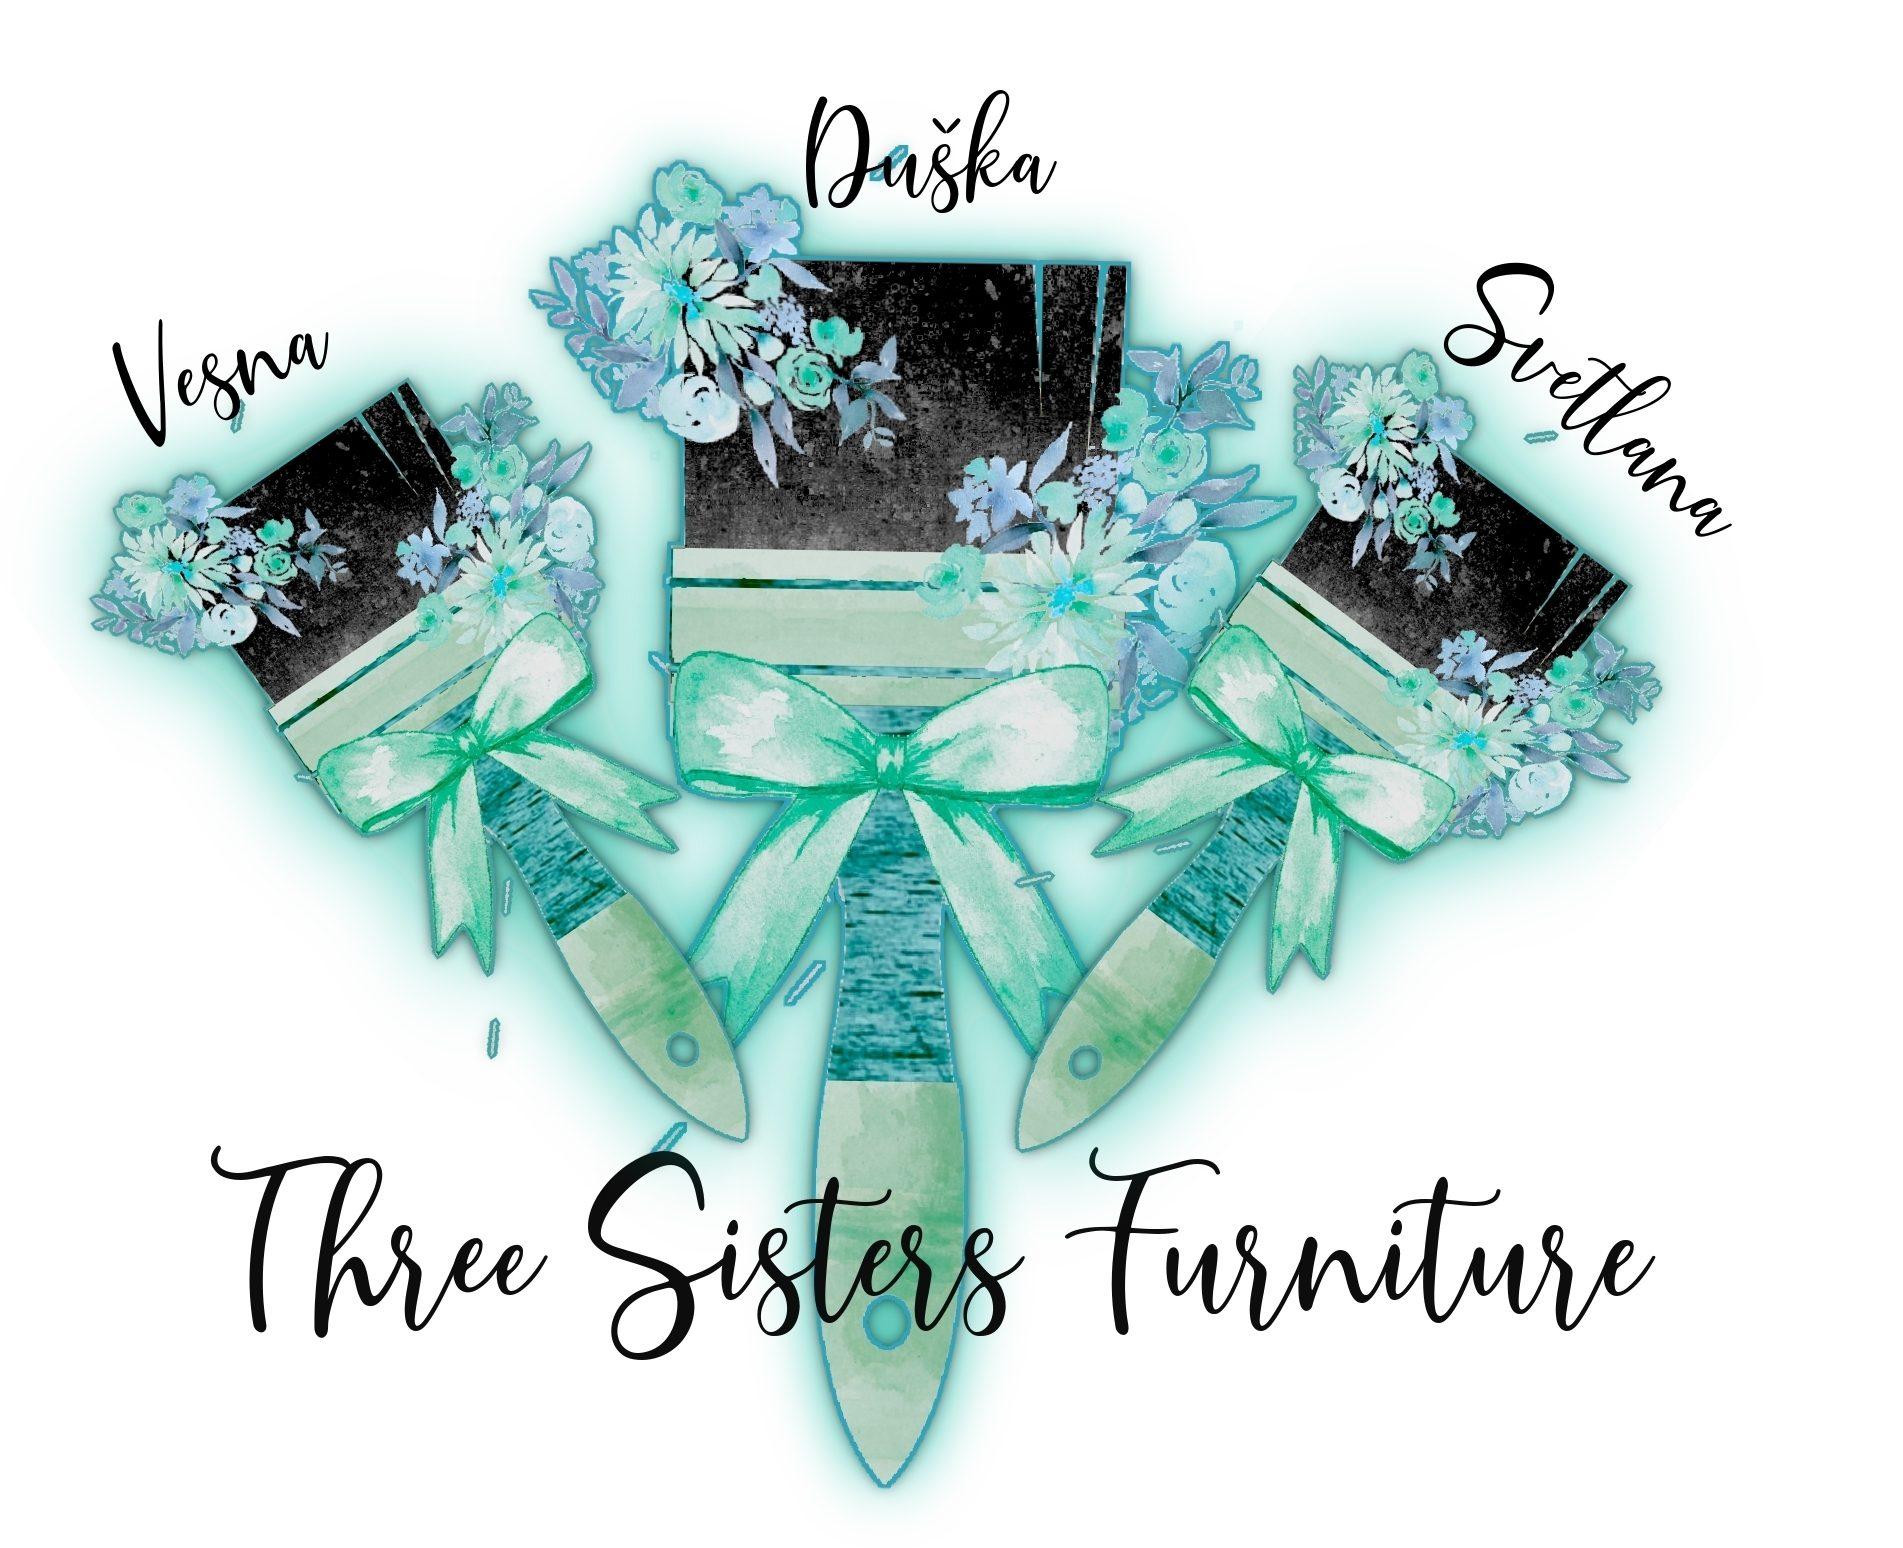 Three Sisters Furniture